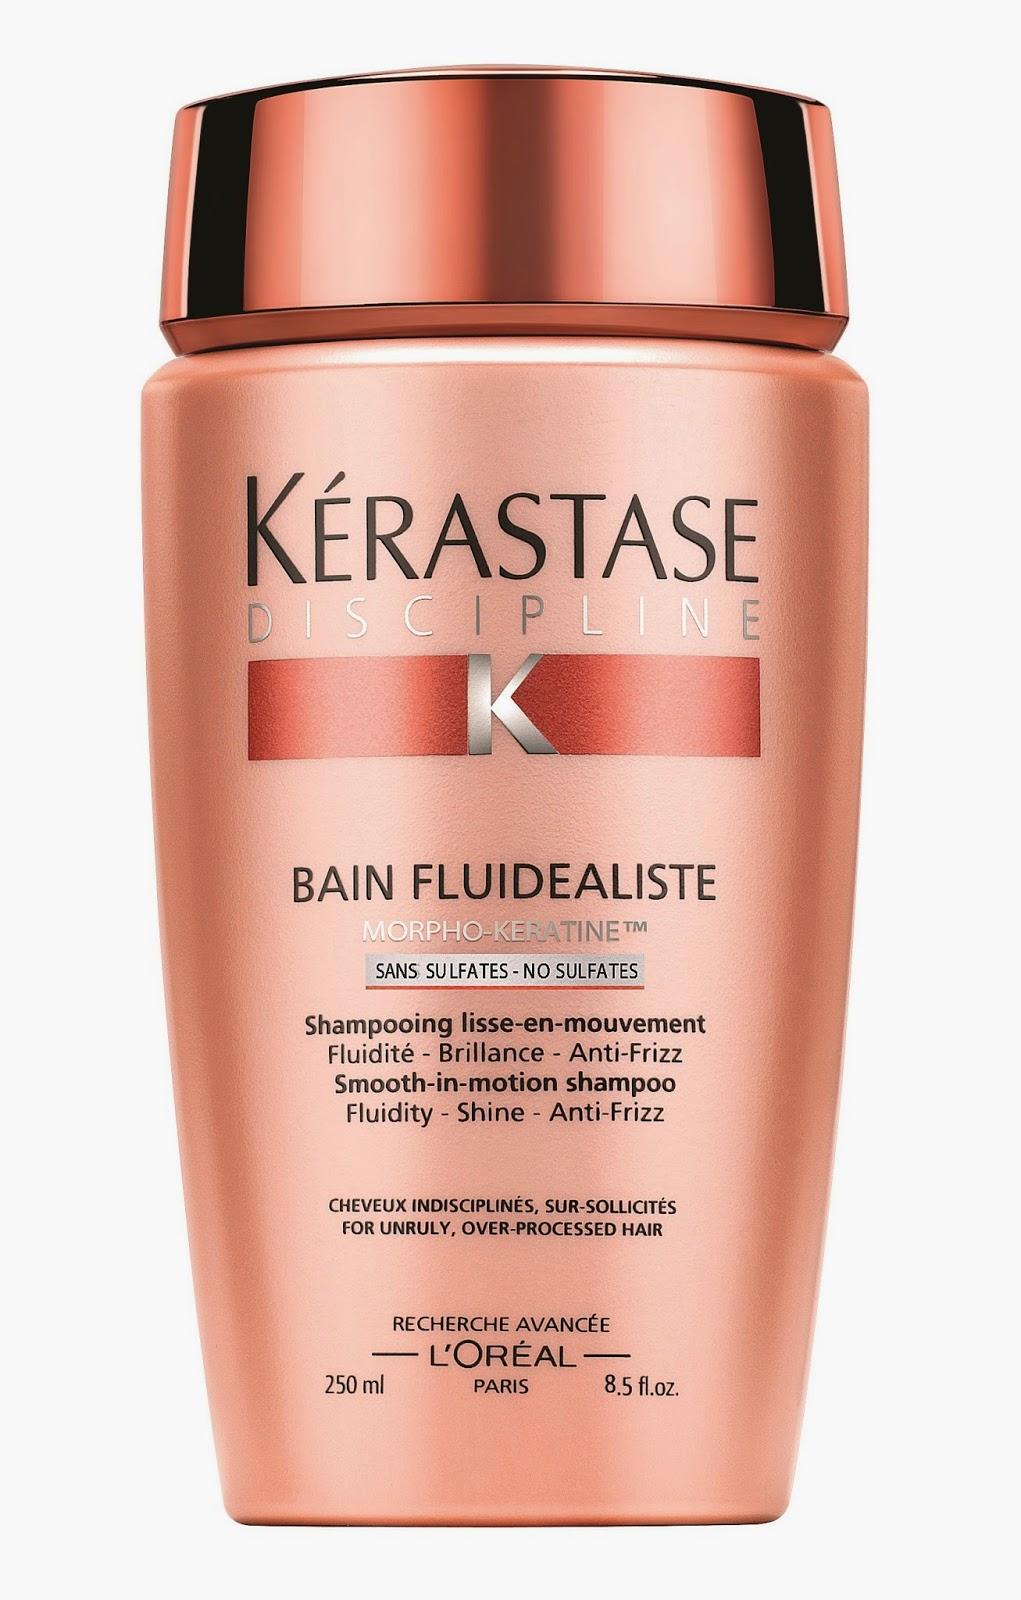 champu sin sulfatos Bain Fluidealiste Kérastase